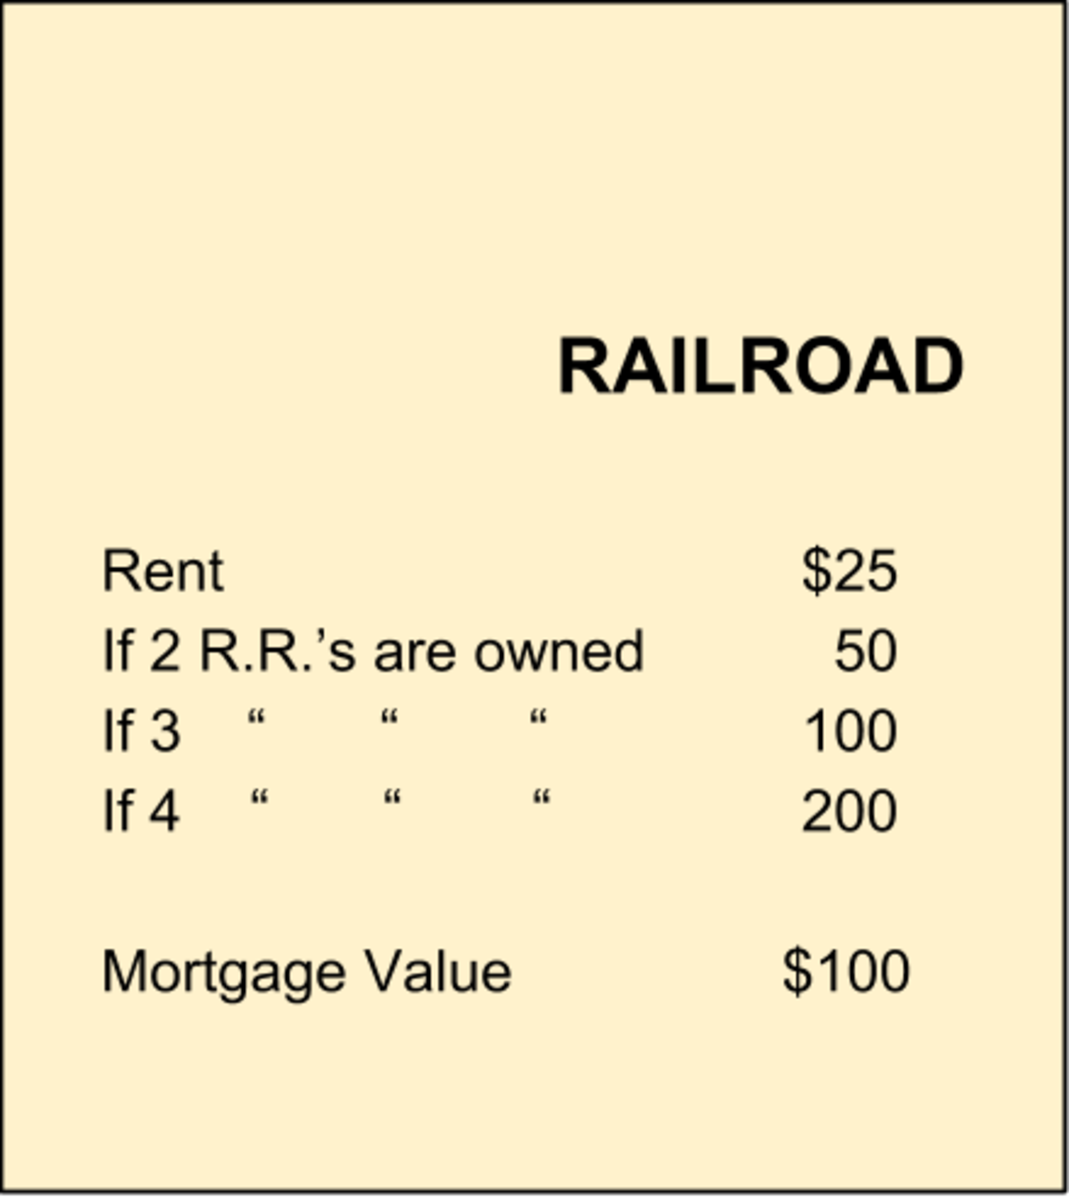 Blank Railroad card.